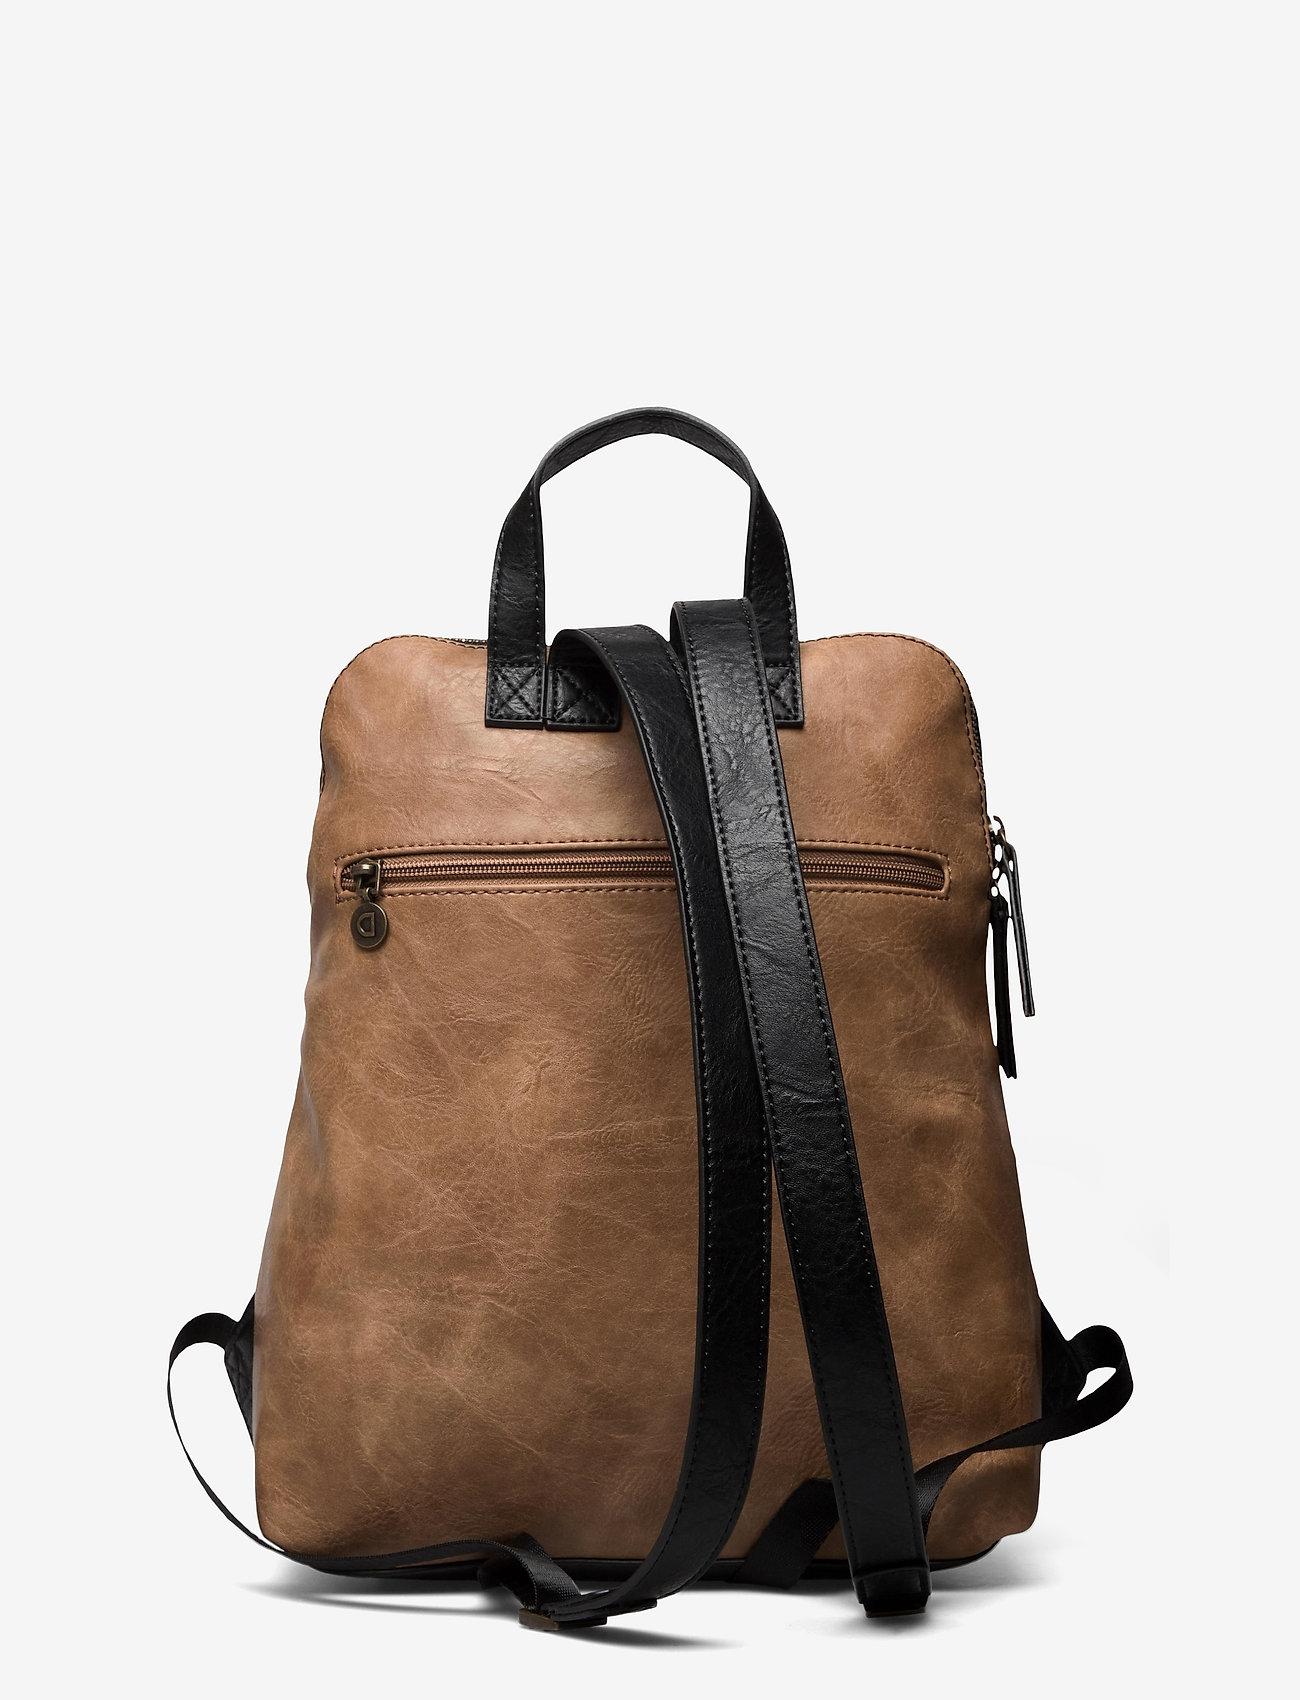 Desigual Accessories - BACK CRISTAL MOON NANAIM - ryggsäckar - tabaco - 1